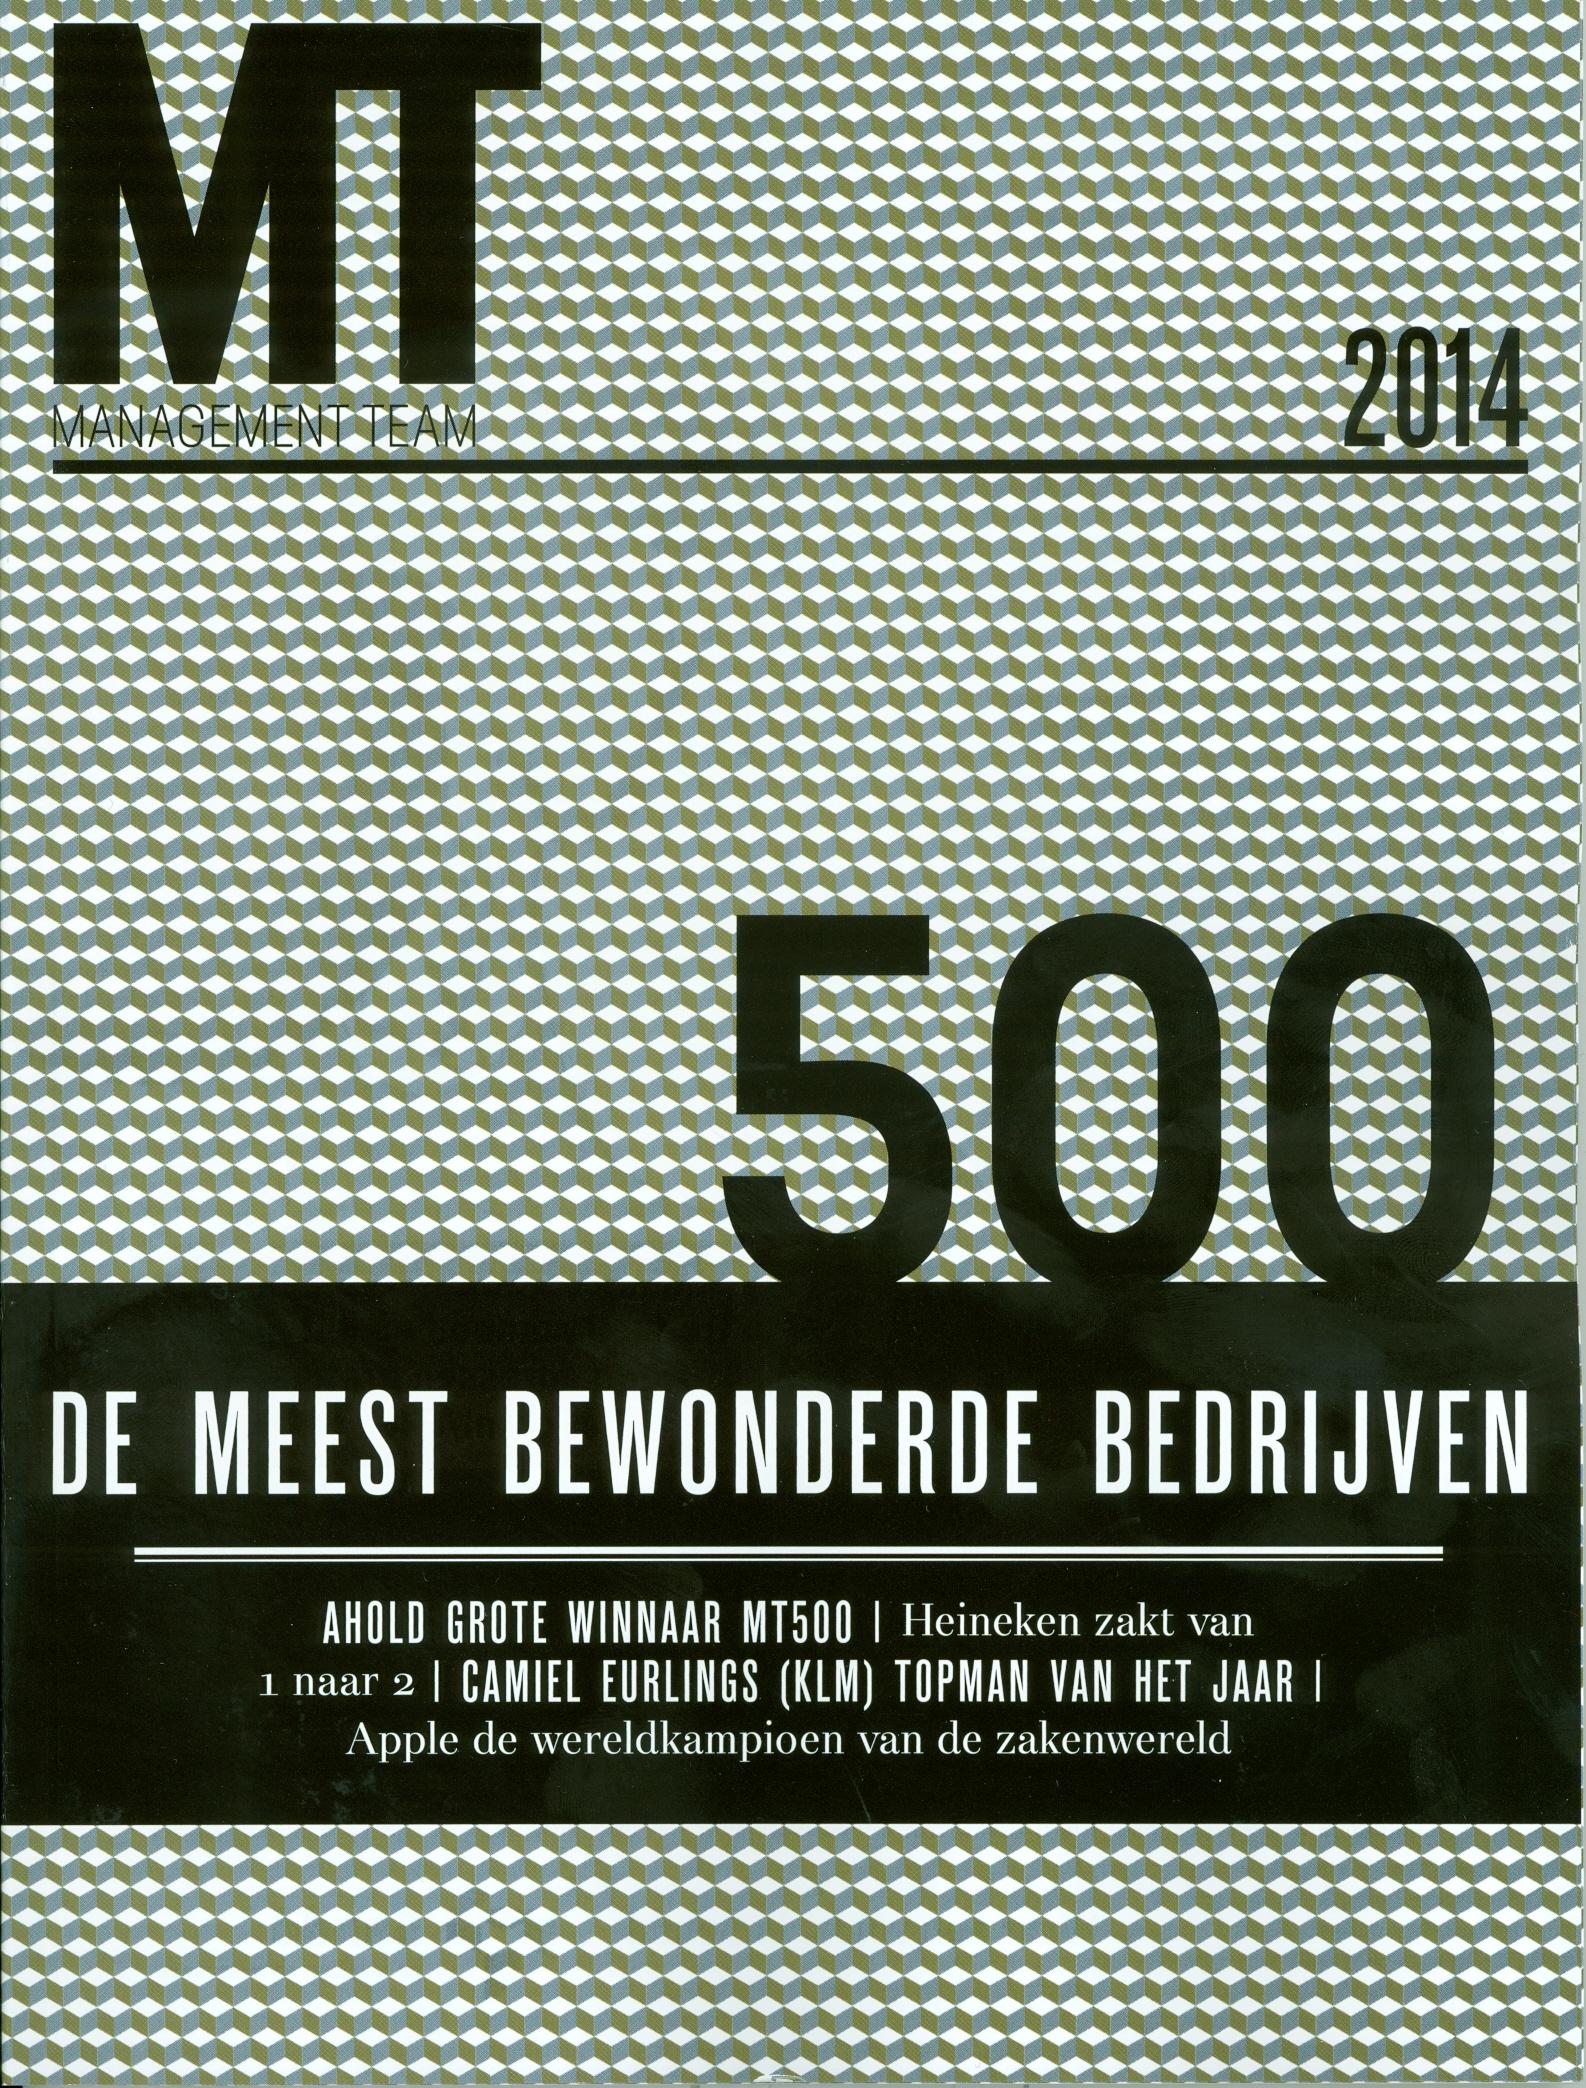 MT500 - 2014